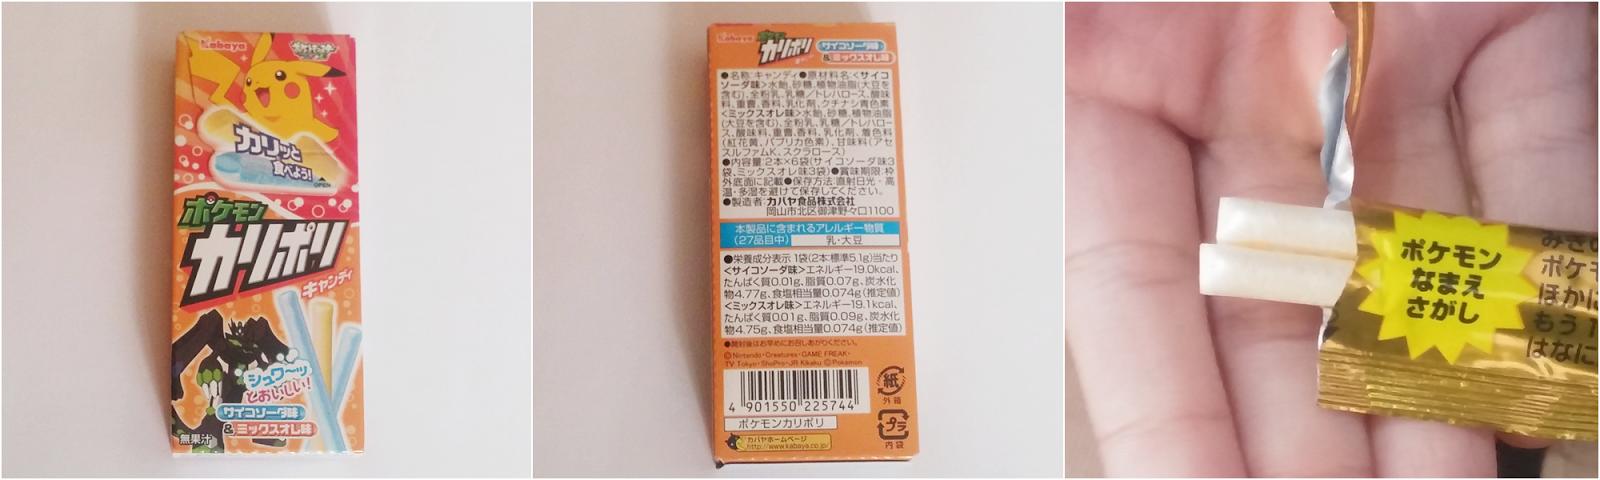 Tokyo Treat Pokemon Stick Candy